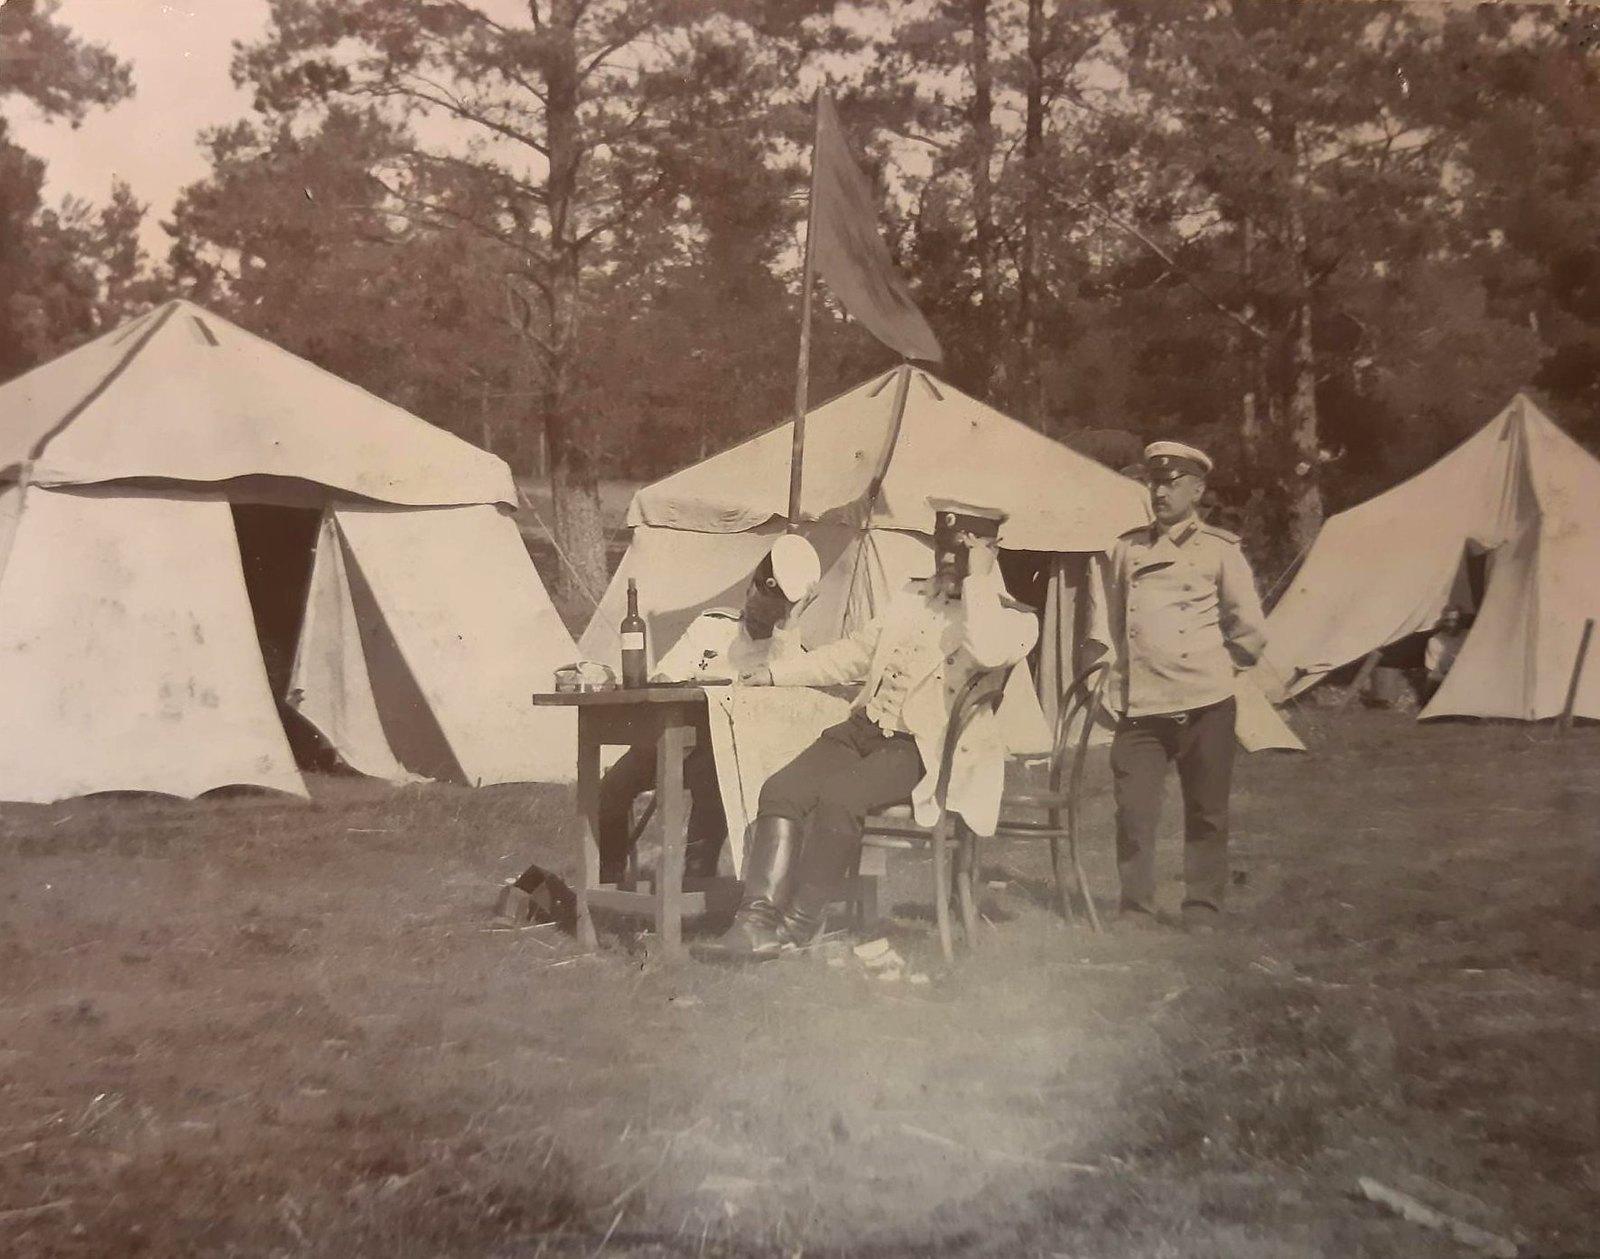 17. Офицеры за столом на фоне лагерных палаток